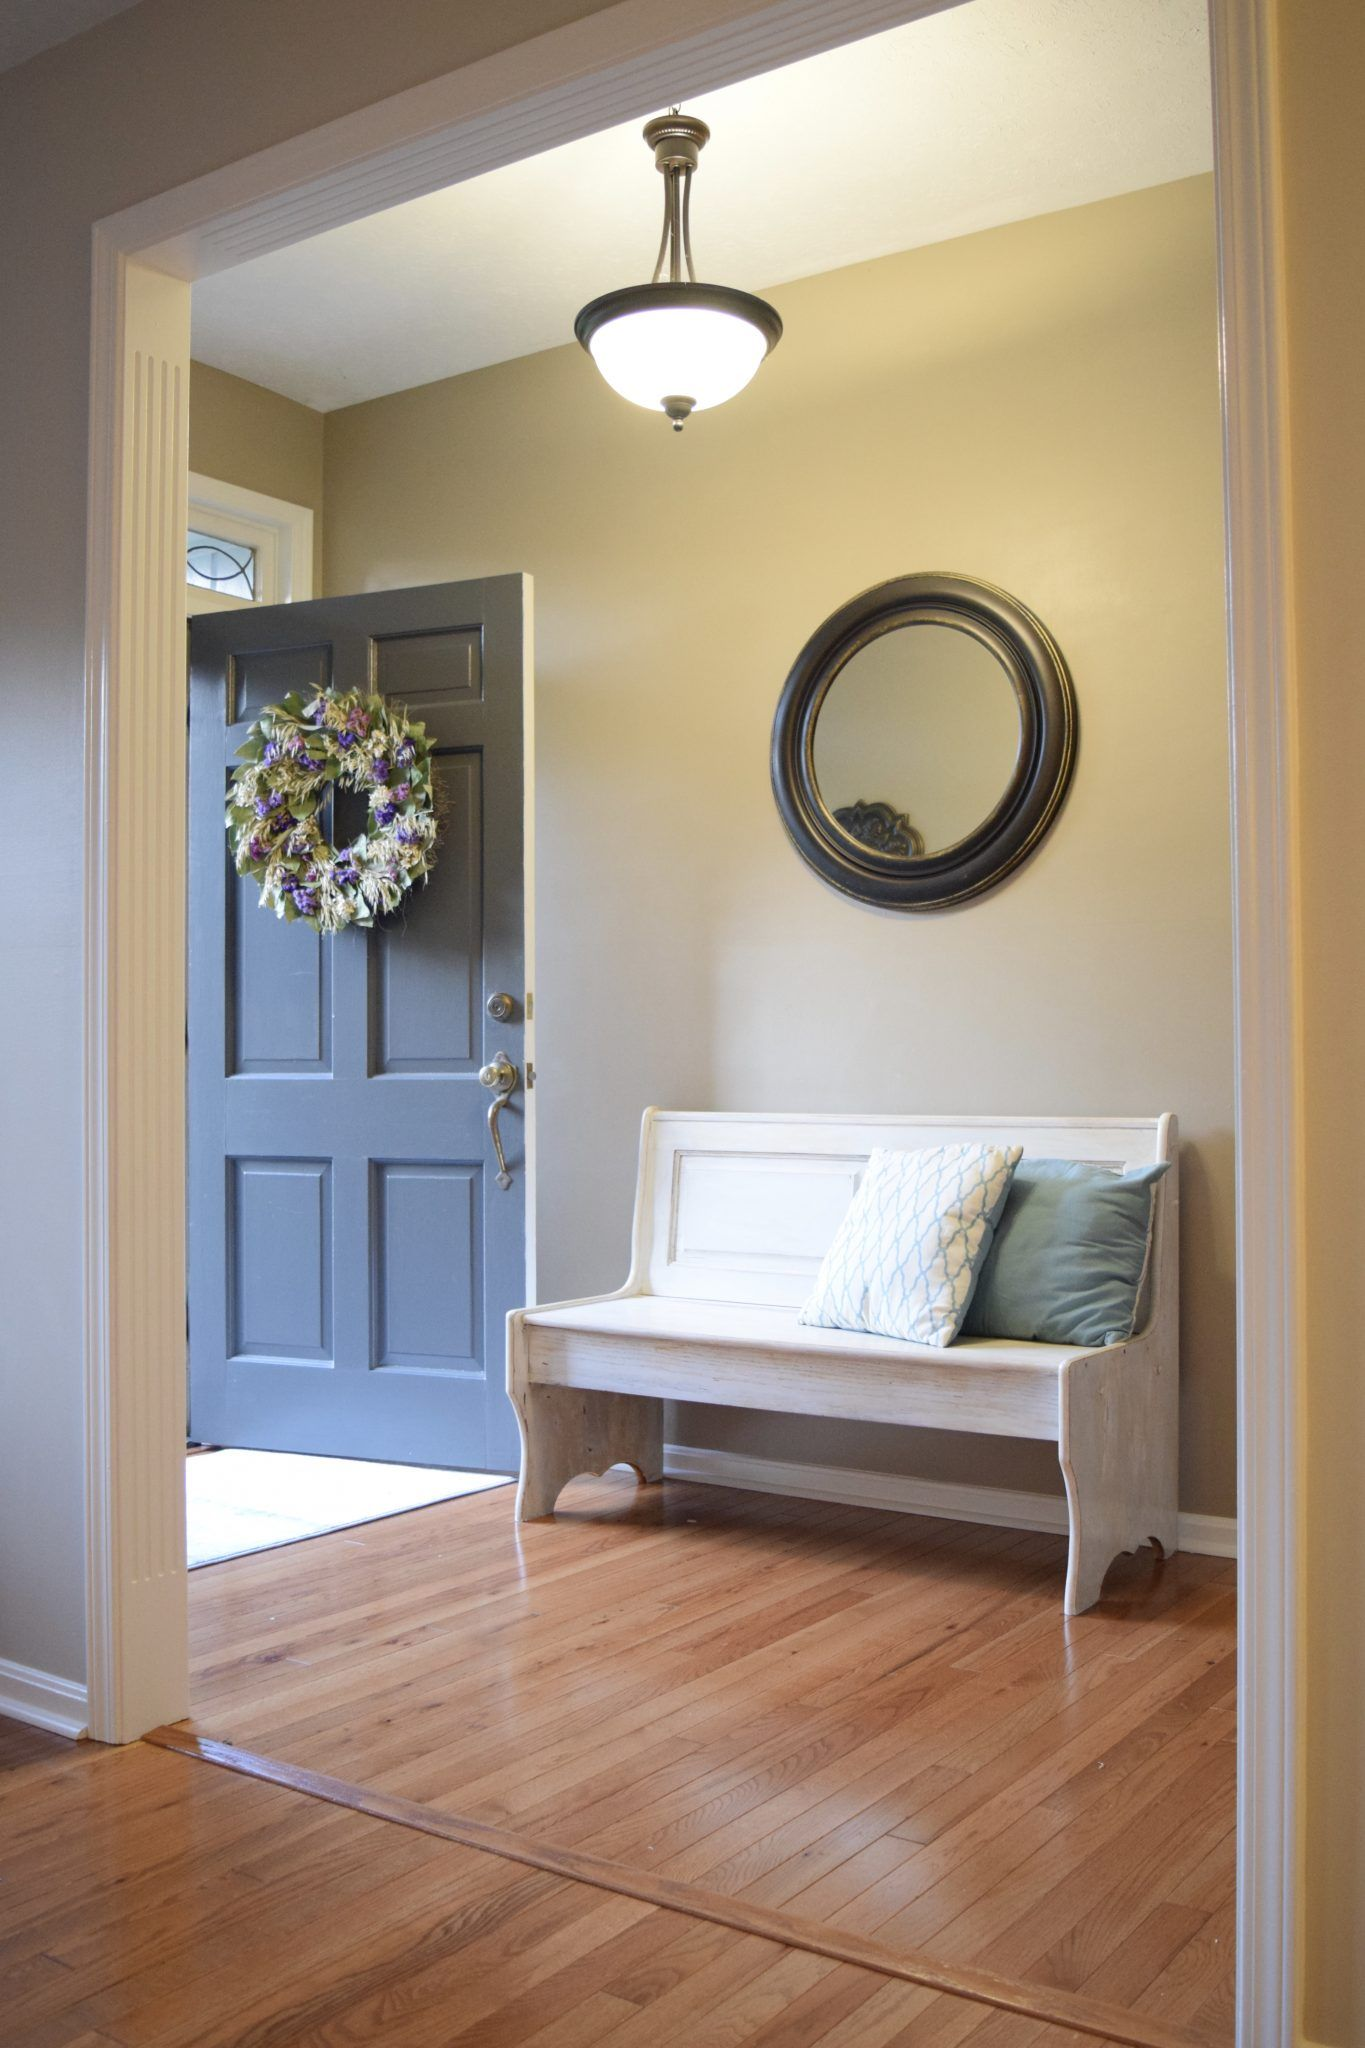 Wall Colors for Honey Oak Cabinets | Honey oak cabinets